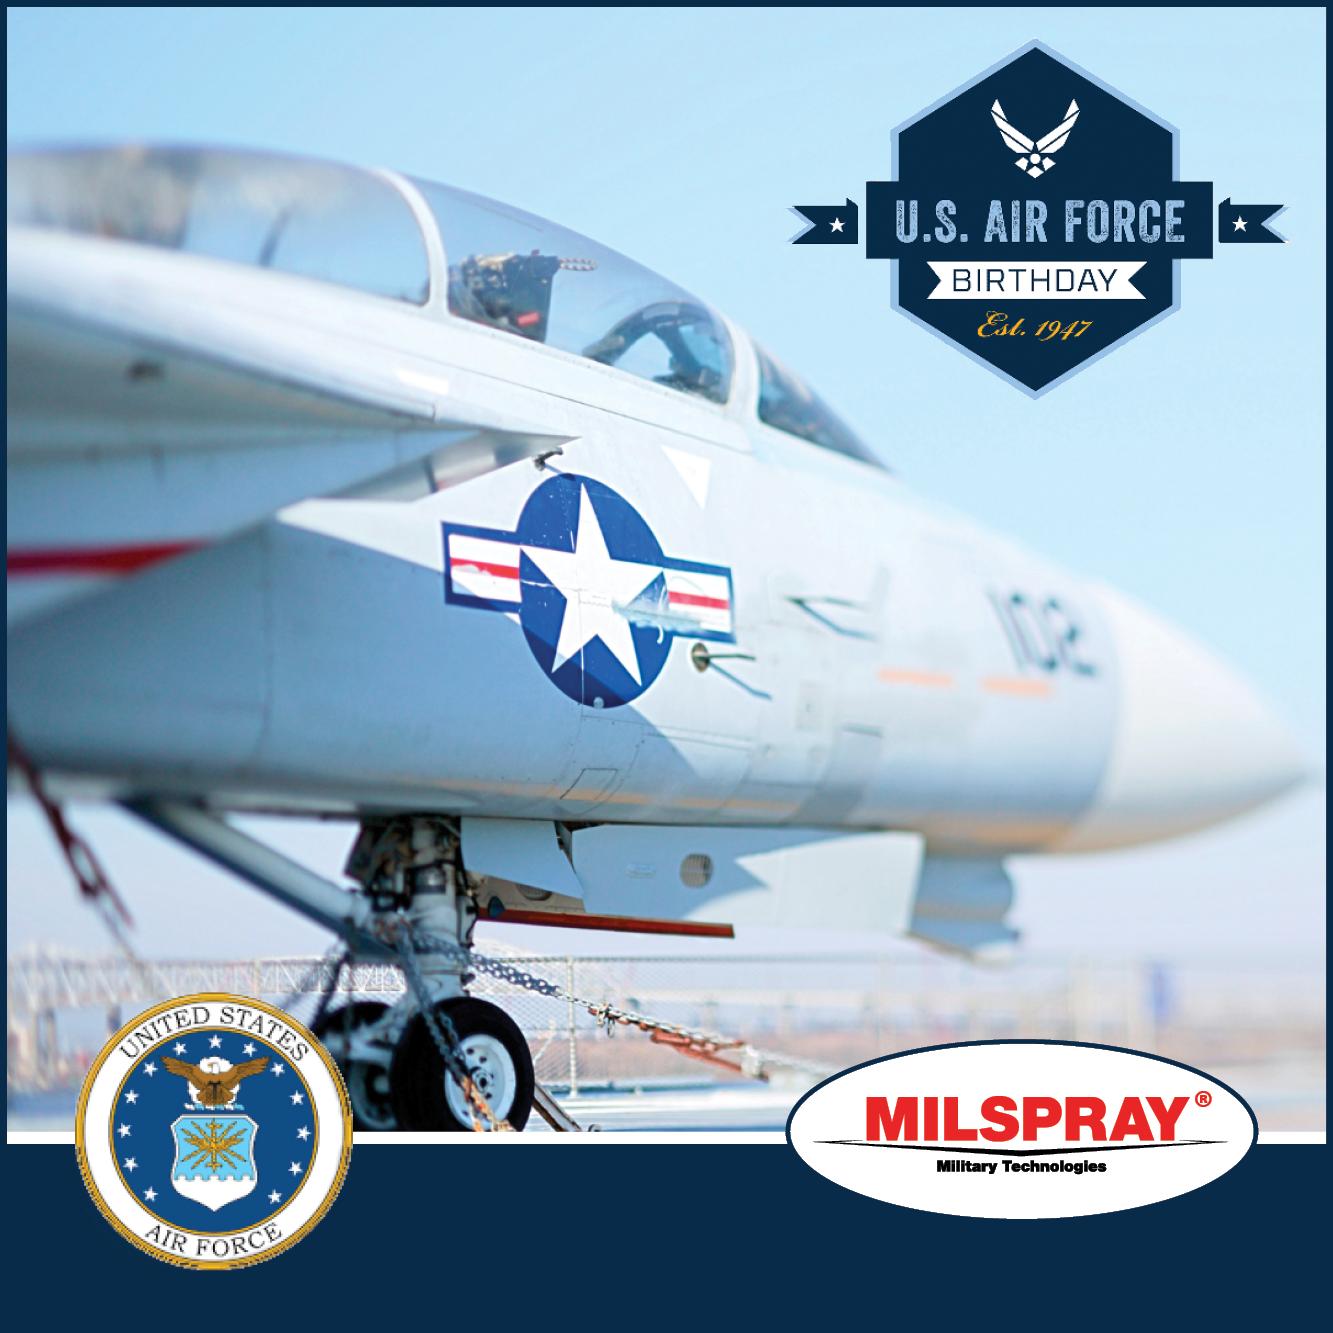 Air Force Birthday (2021)